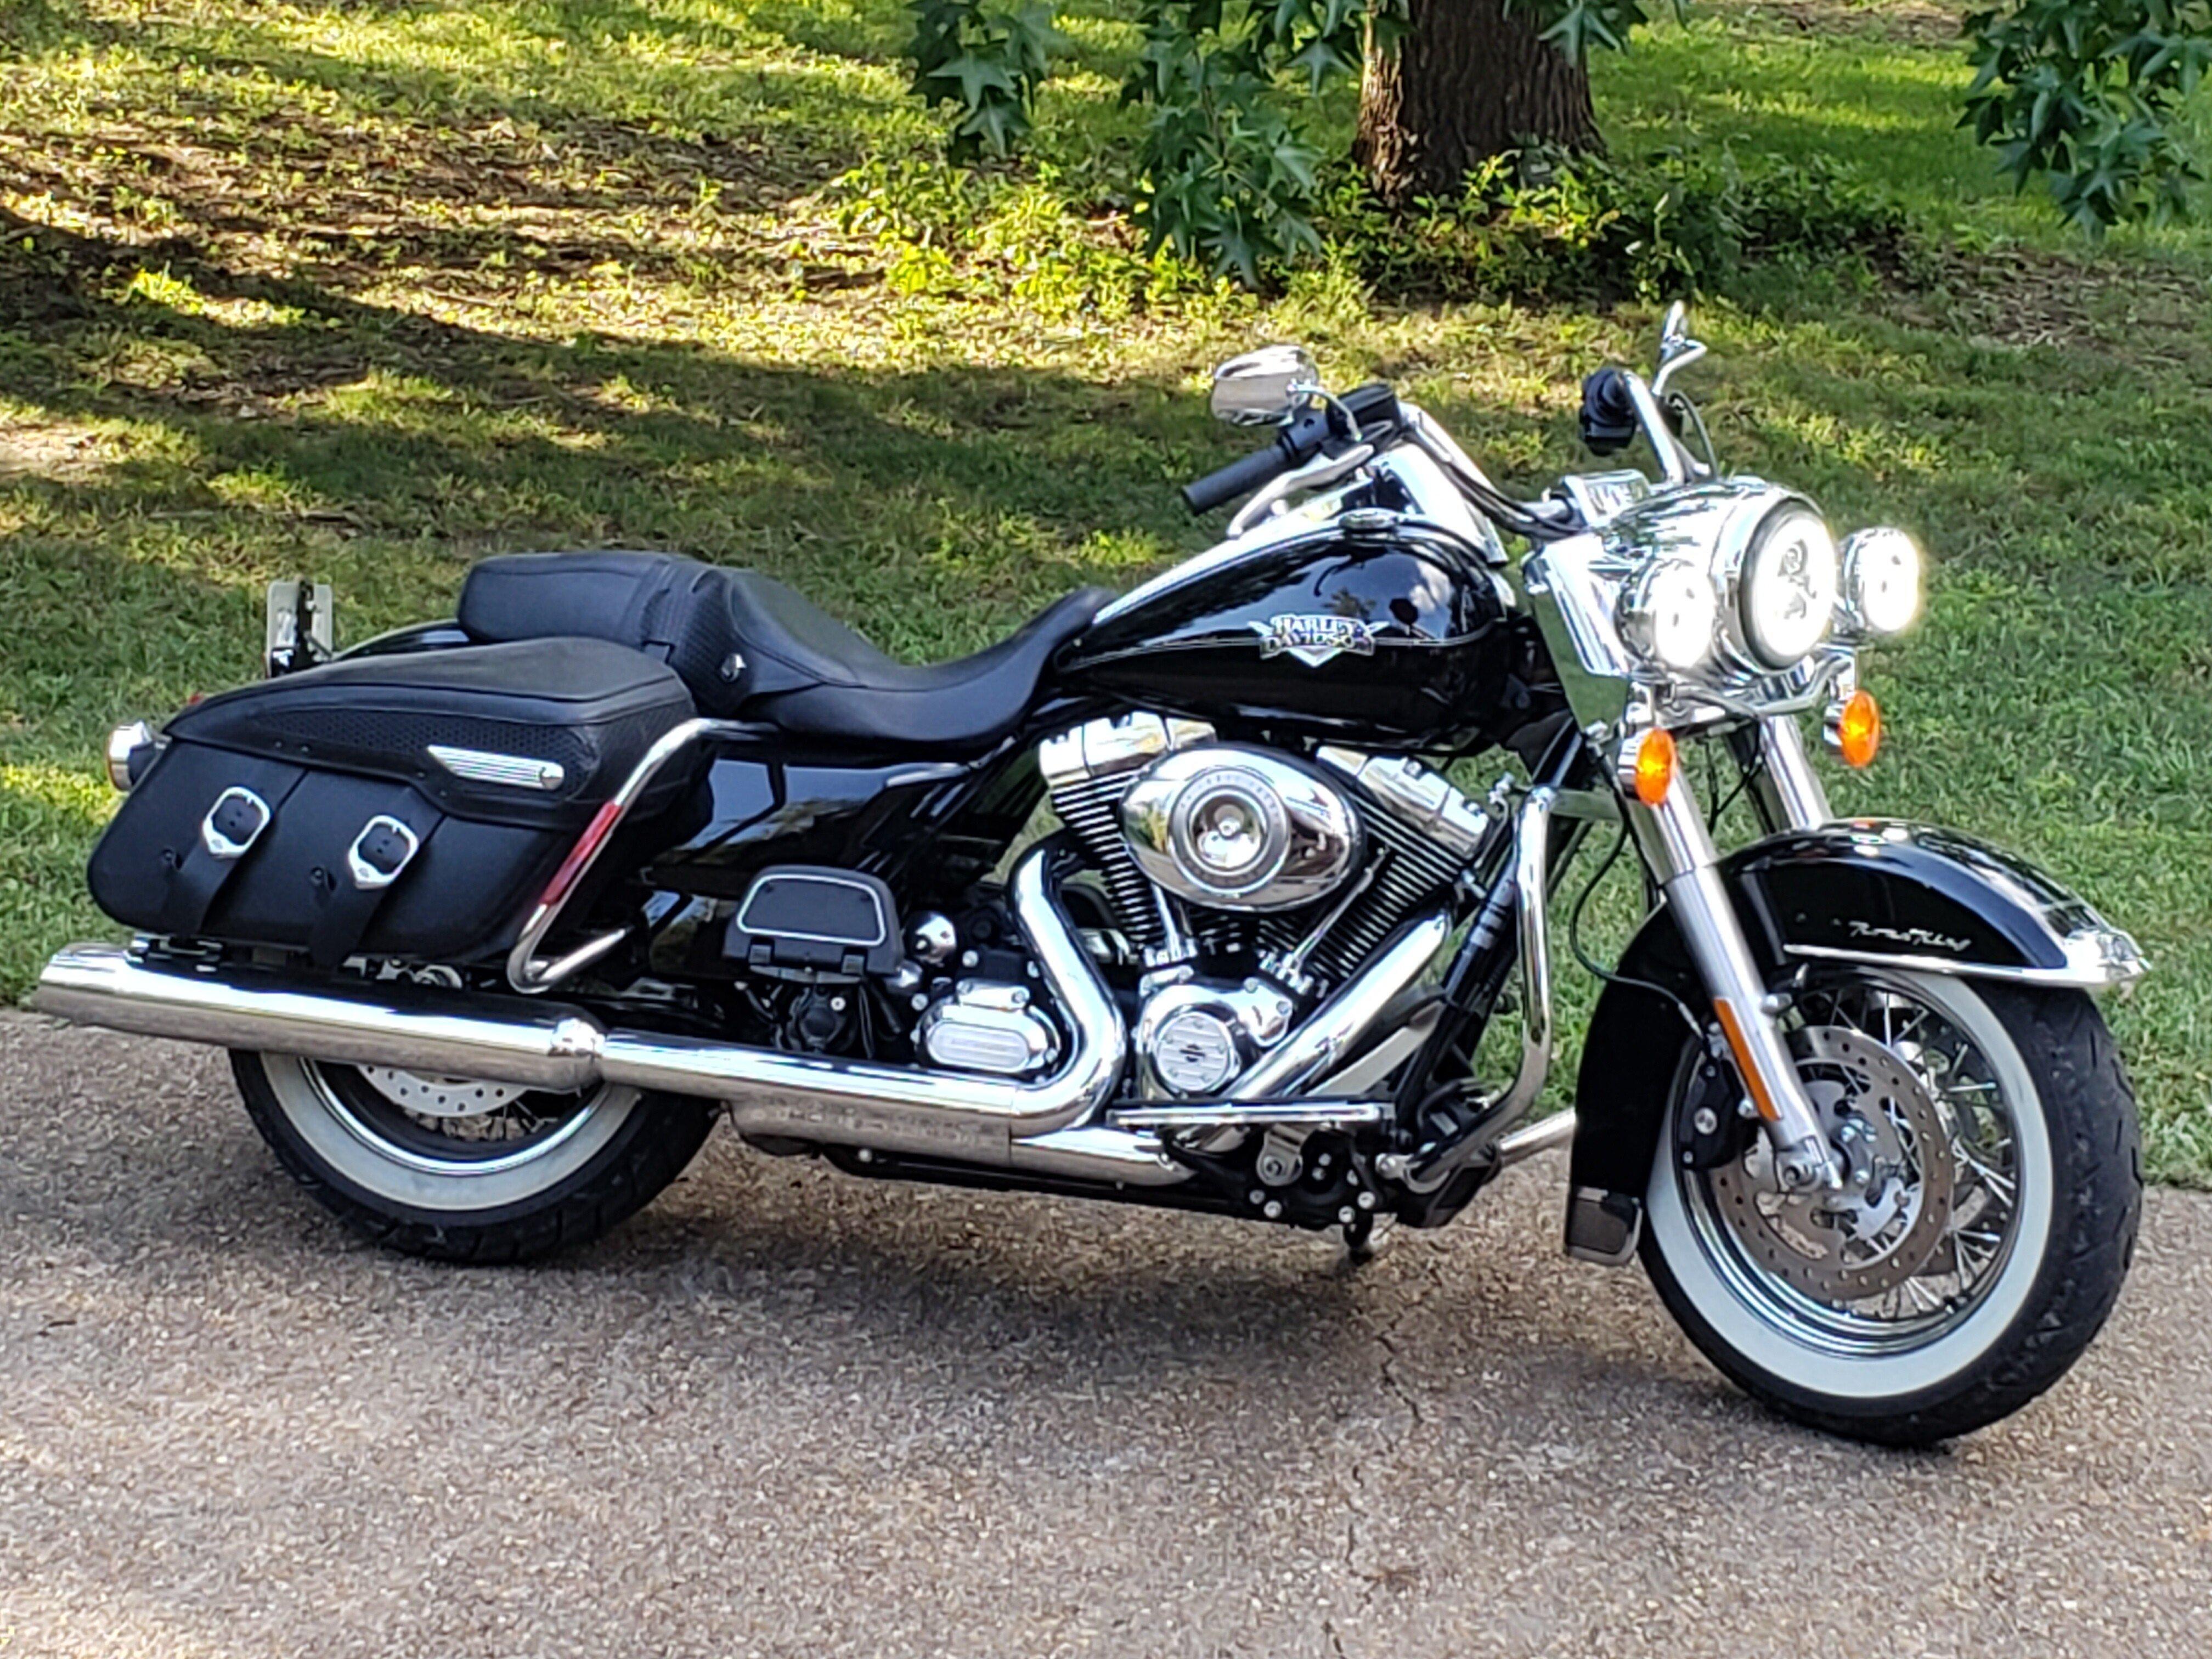 Harley Davidson Road King Classic For Sale Off 64 Www Abrafiltros Org Br